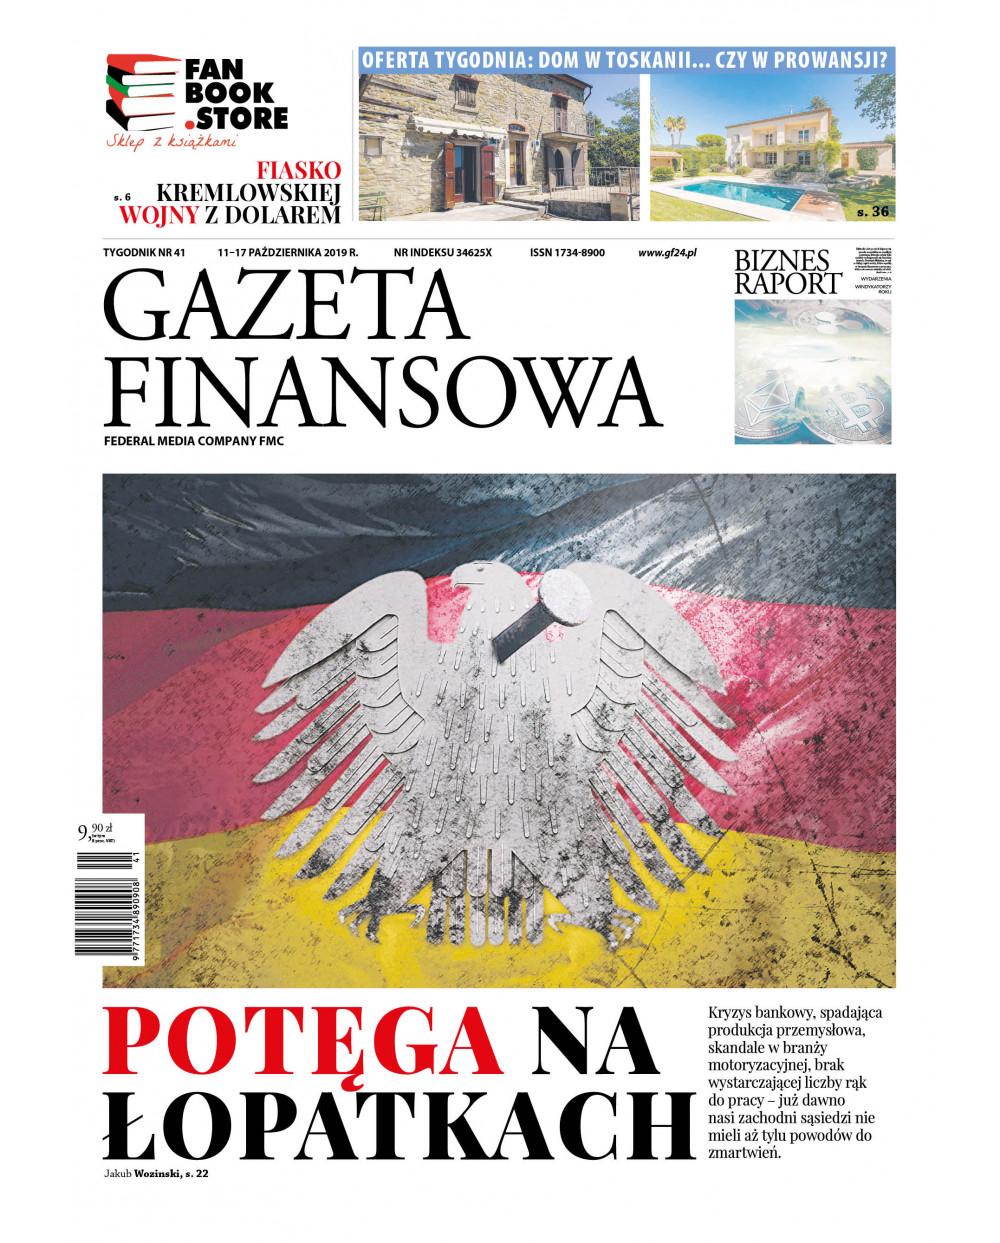 Gazeta Finansowa 41/2019